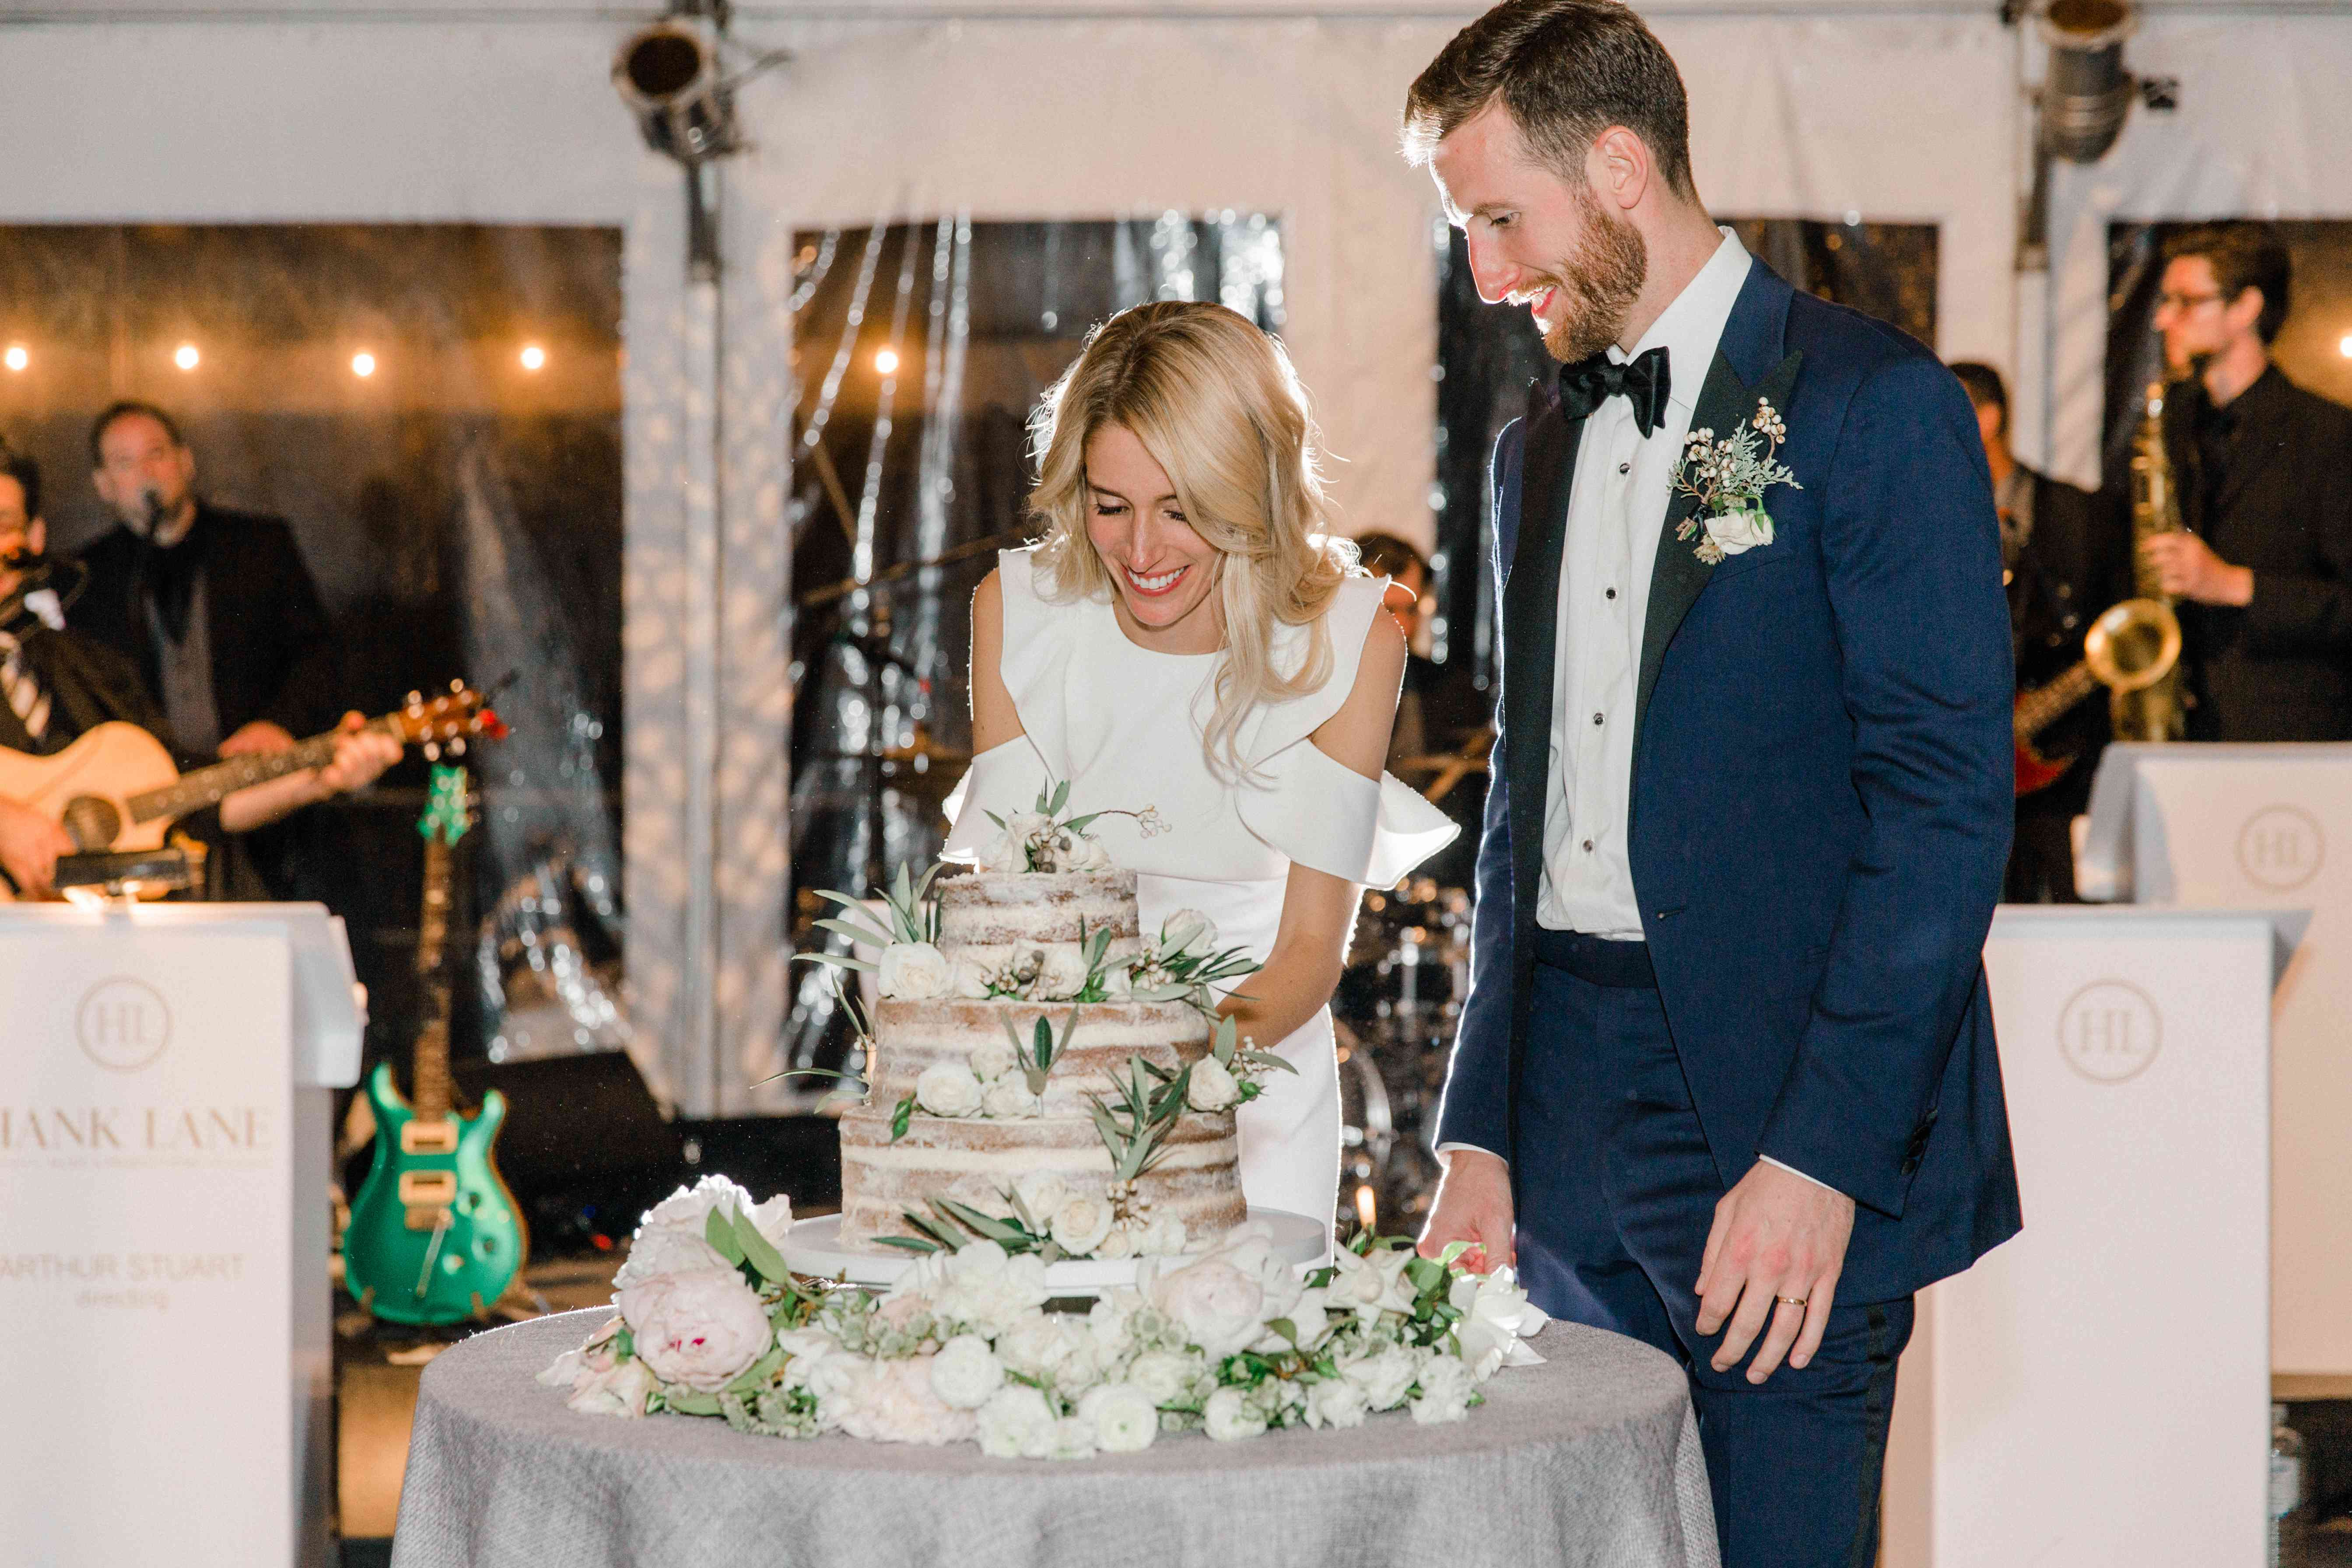 <p>cutting wedding cake</p><br><br>